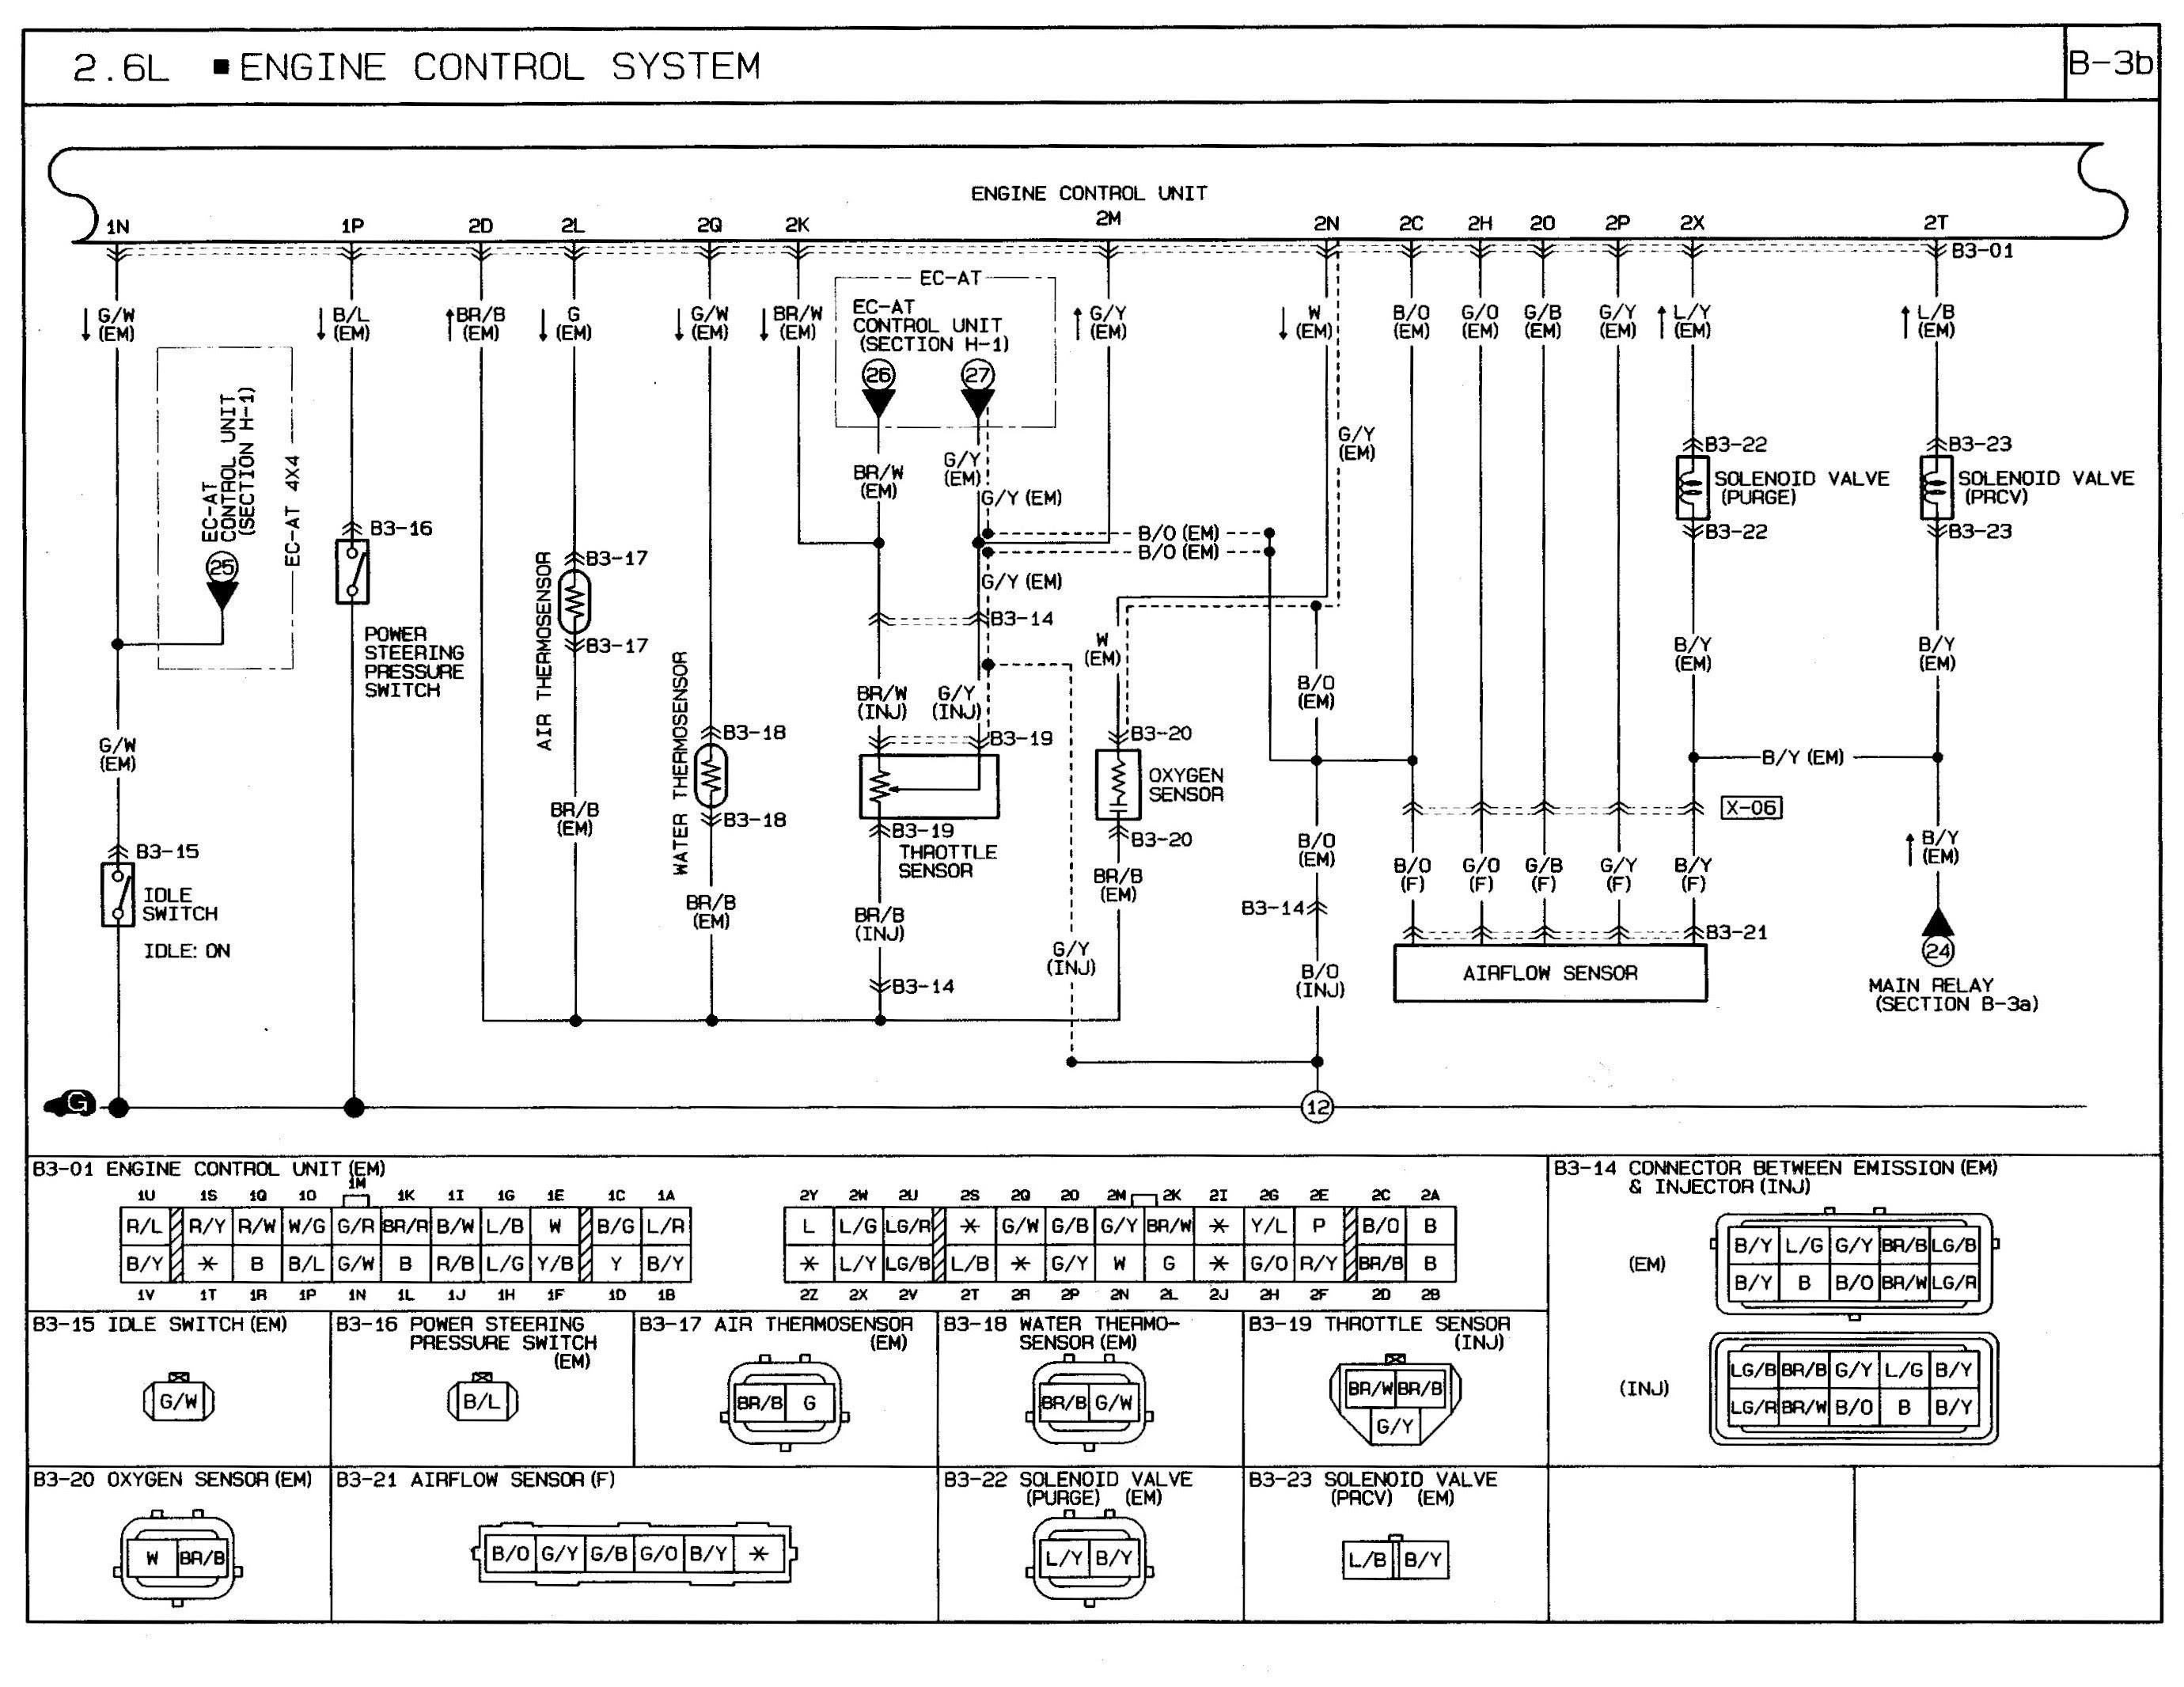 Diagram In Pictures Database Mazda Tribute V6 Wiring Diagram Just Download Or Read Wiring Diagram Online Casalamm Edu Mx